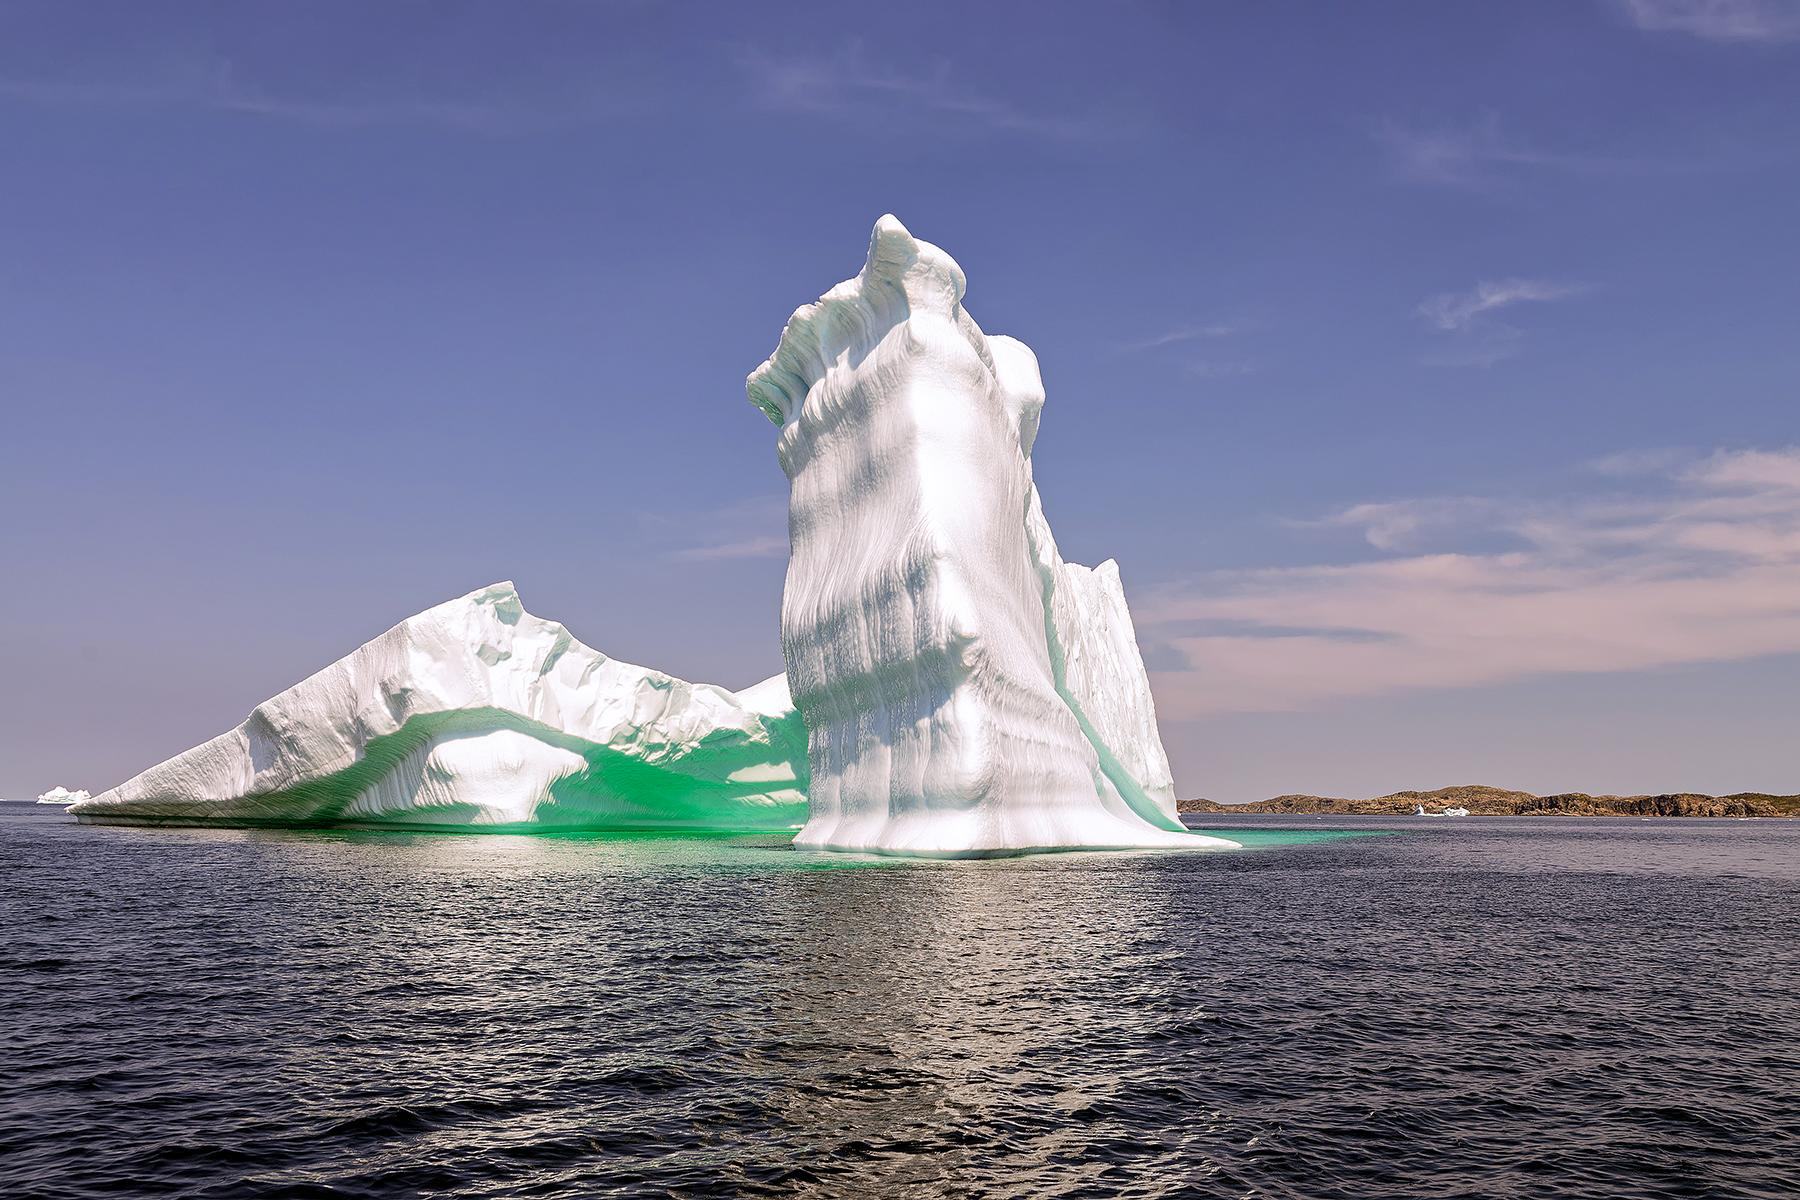 03_Atlantic_Canada_Outdoors_Iceberg_shutterstock_400955818